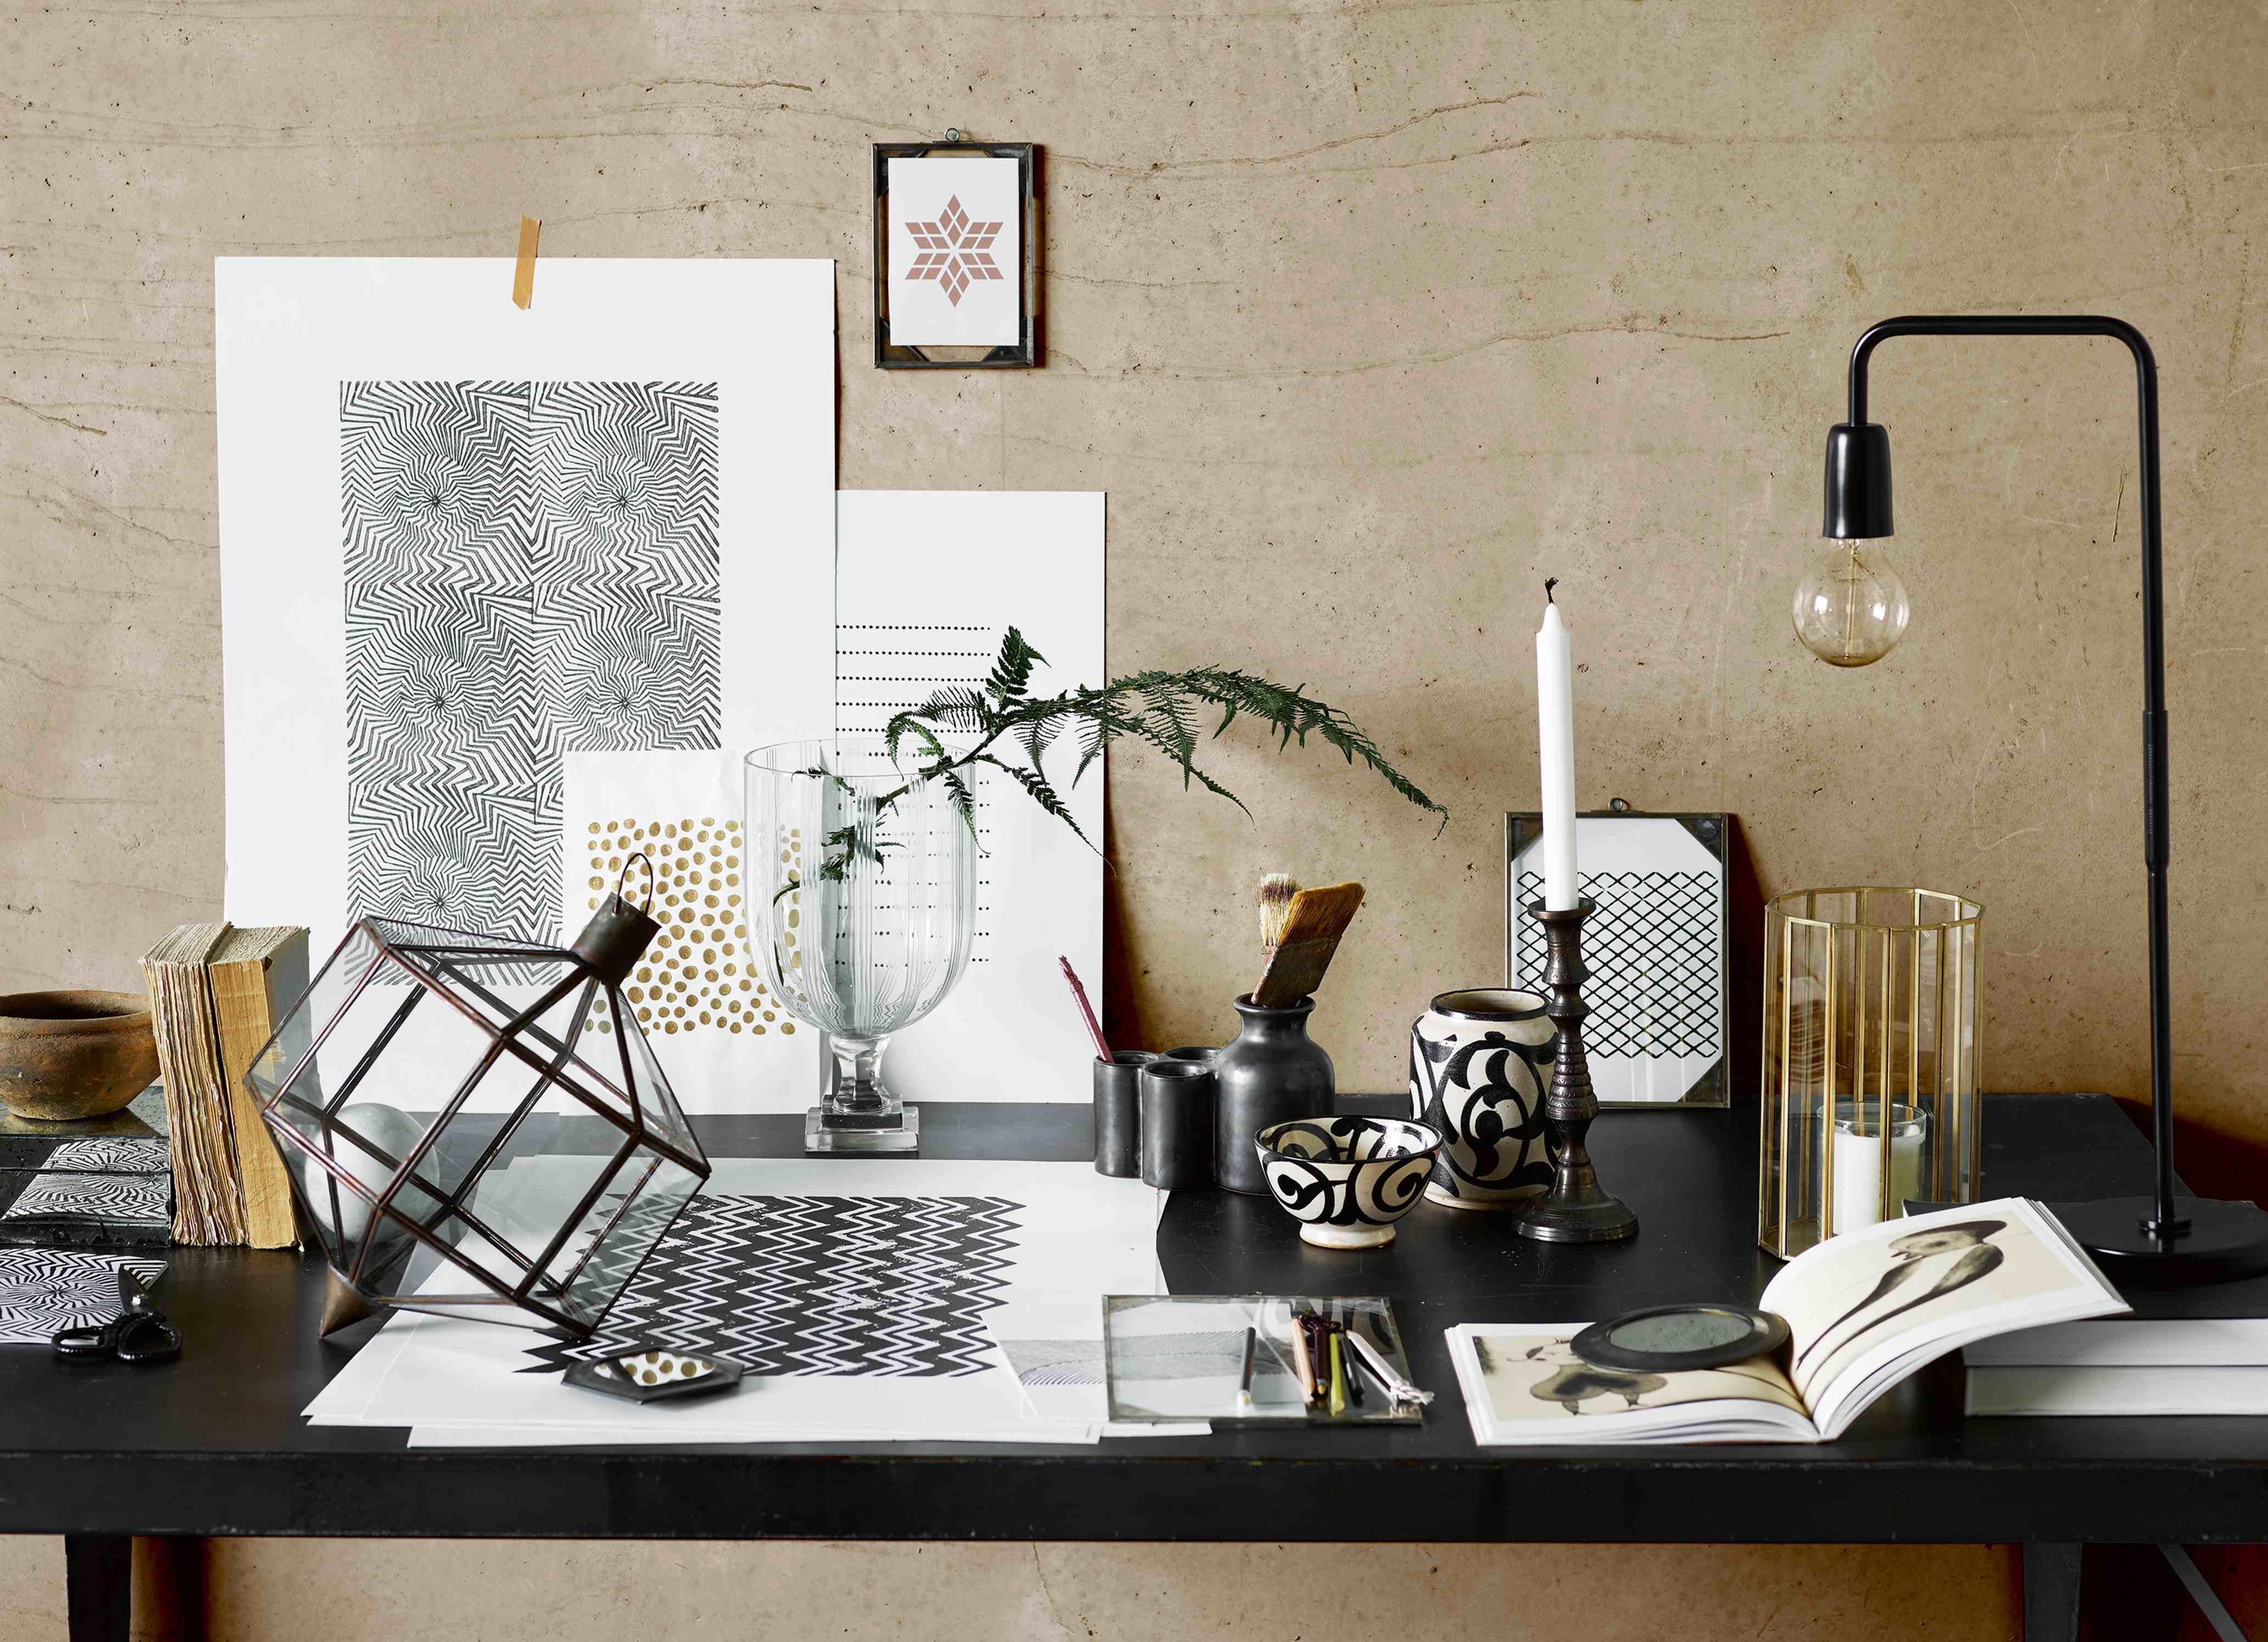 Platz für kreatives Schaffen | Sweet Home